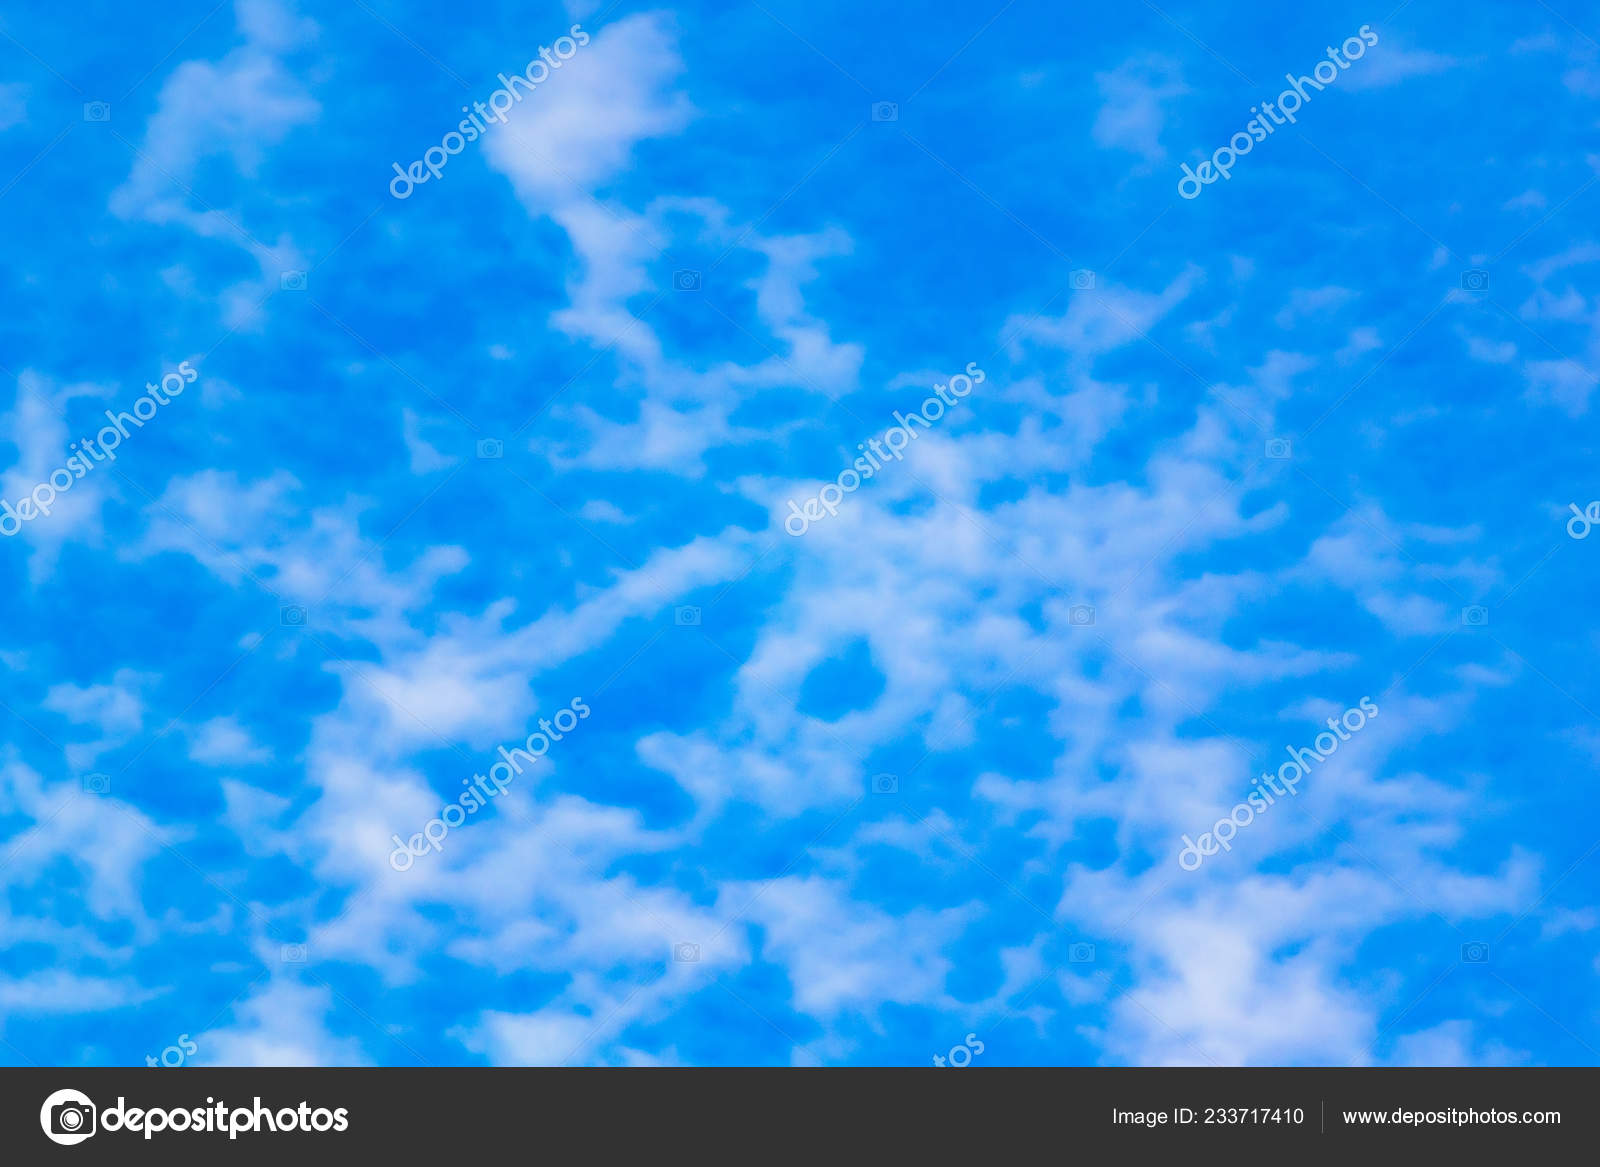 Rainy Wallpaper Iphone White Clouds Rainy Day Strangely